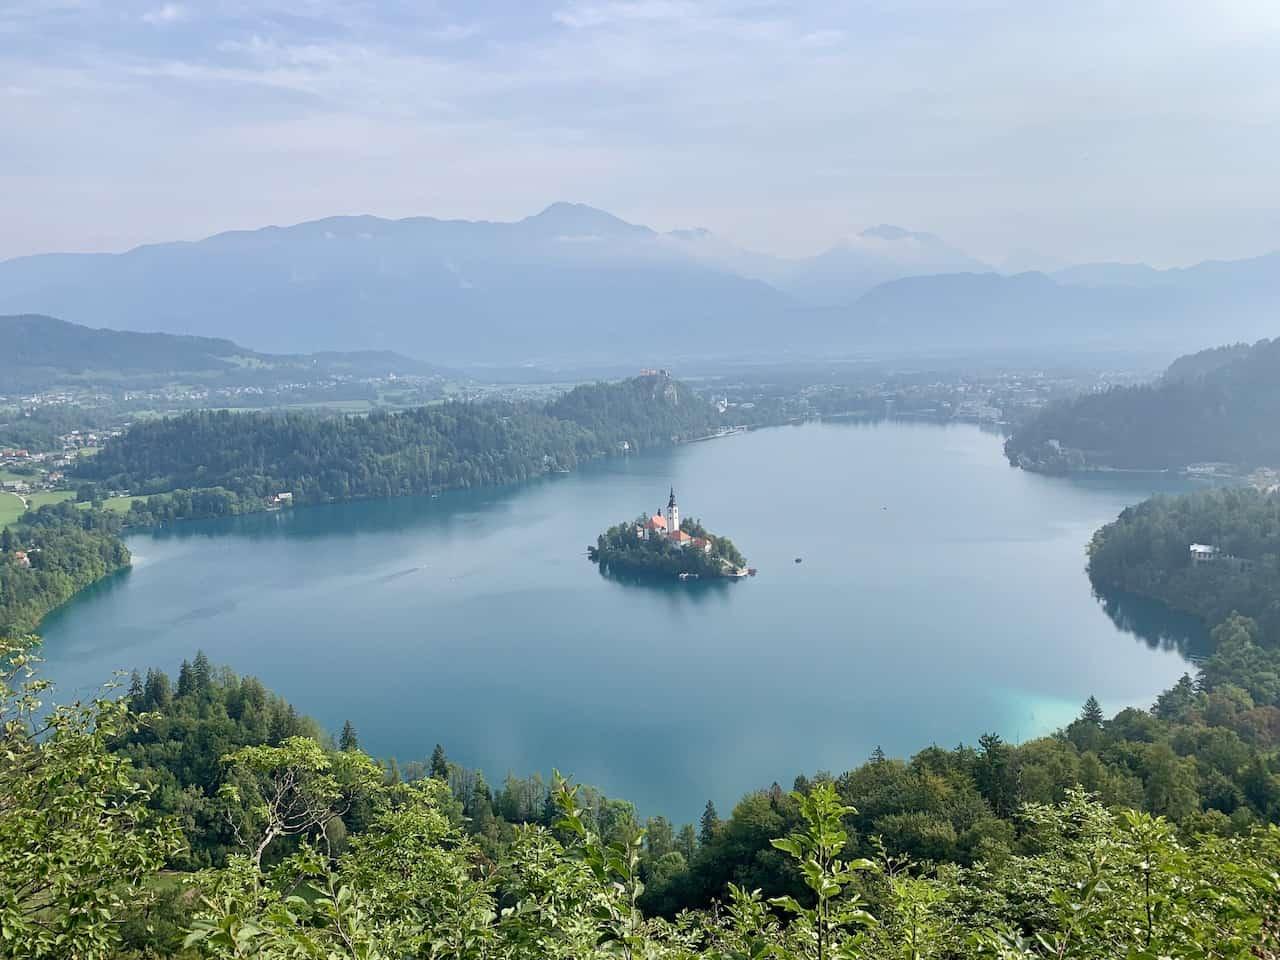 Mala Osojnica Lake Bled